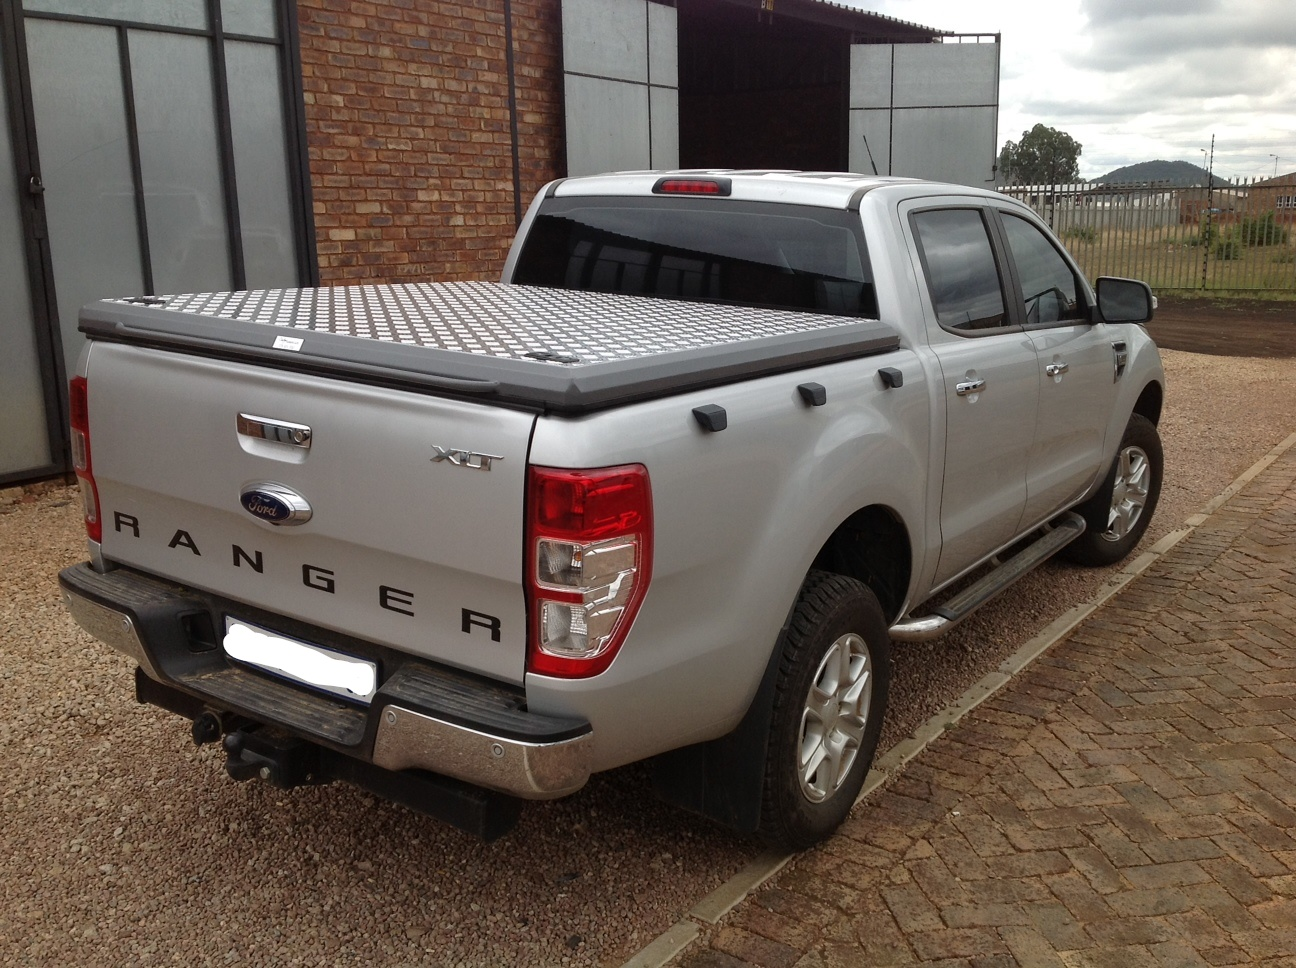 Brand New Lockable Load Bin Cover for Ford Ranger